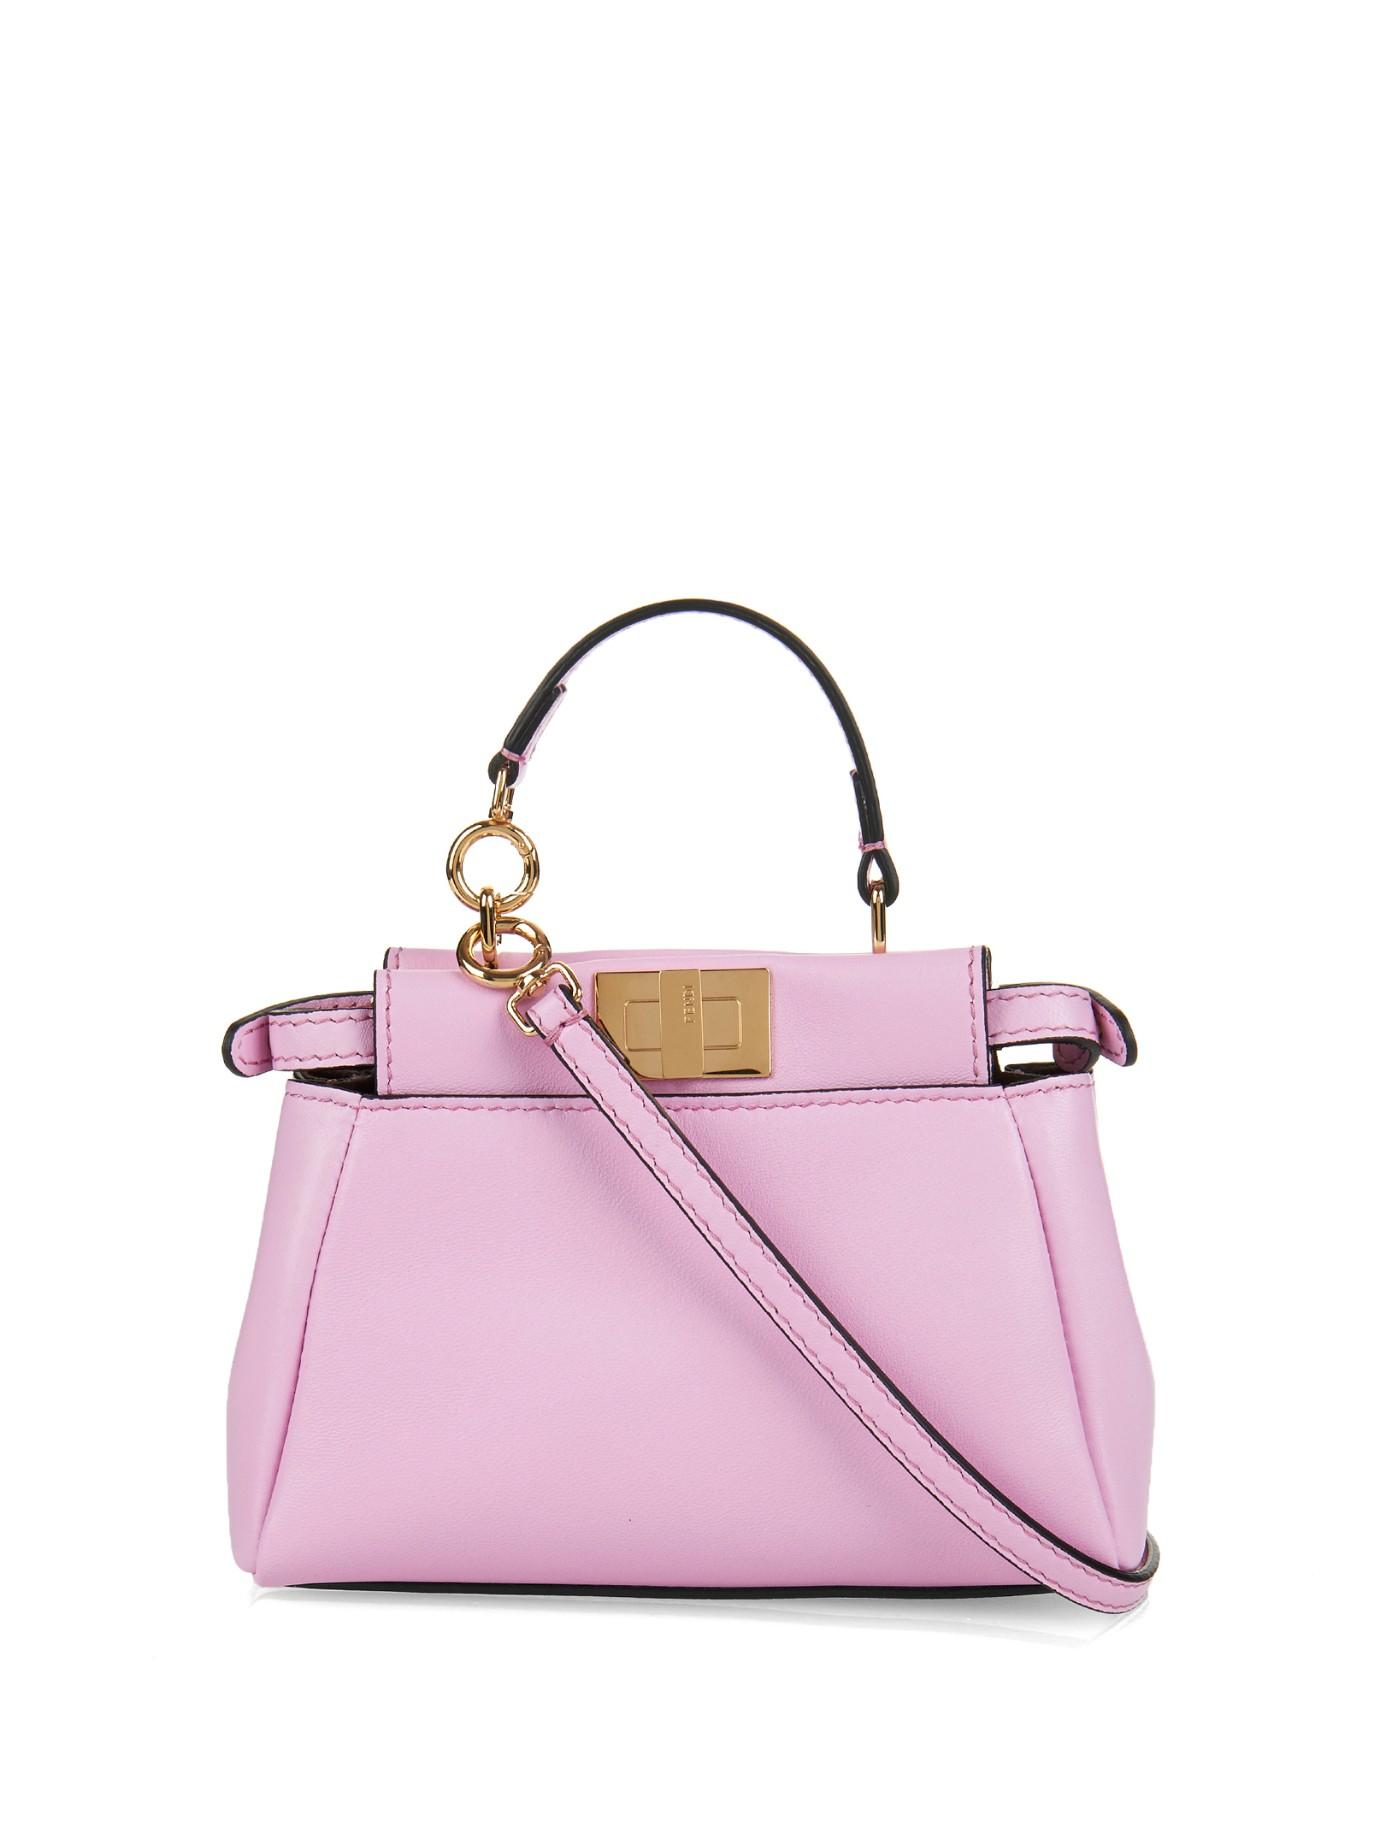 0f303e5d13 Fendi Micro Peekaboo Leather Cross-Body Bag in Pink - Lyst